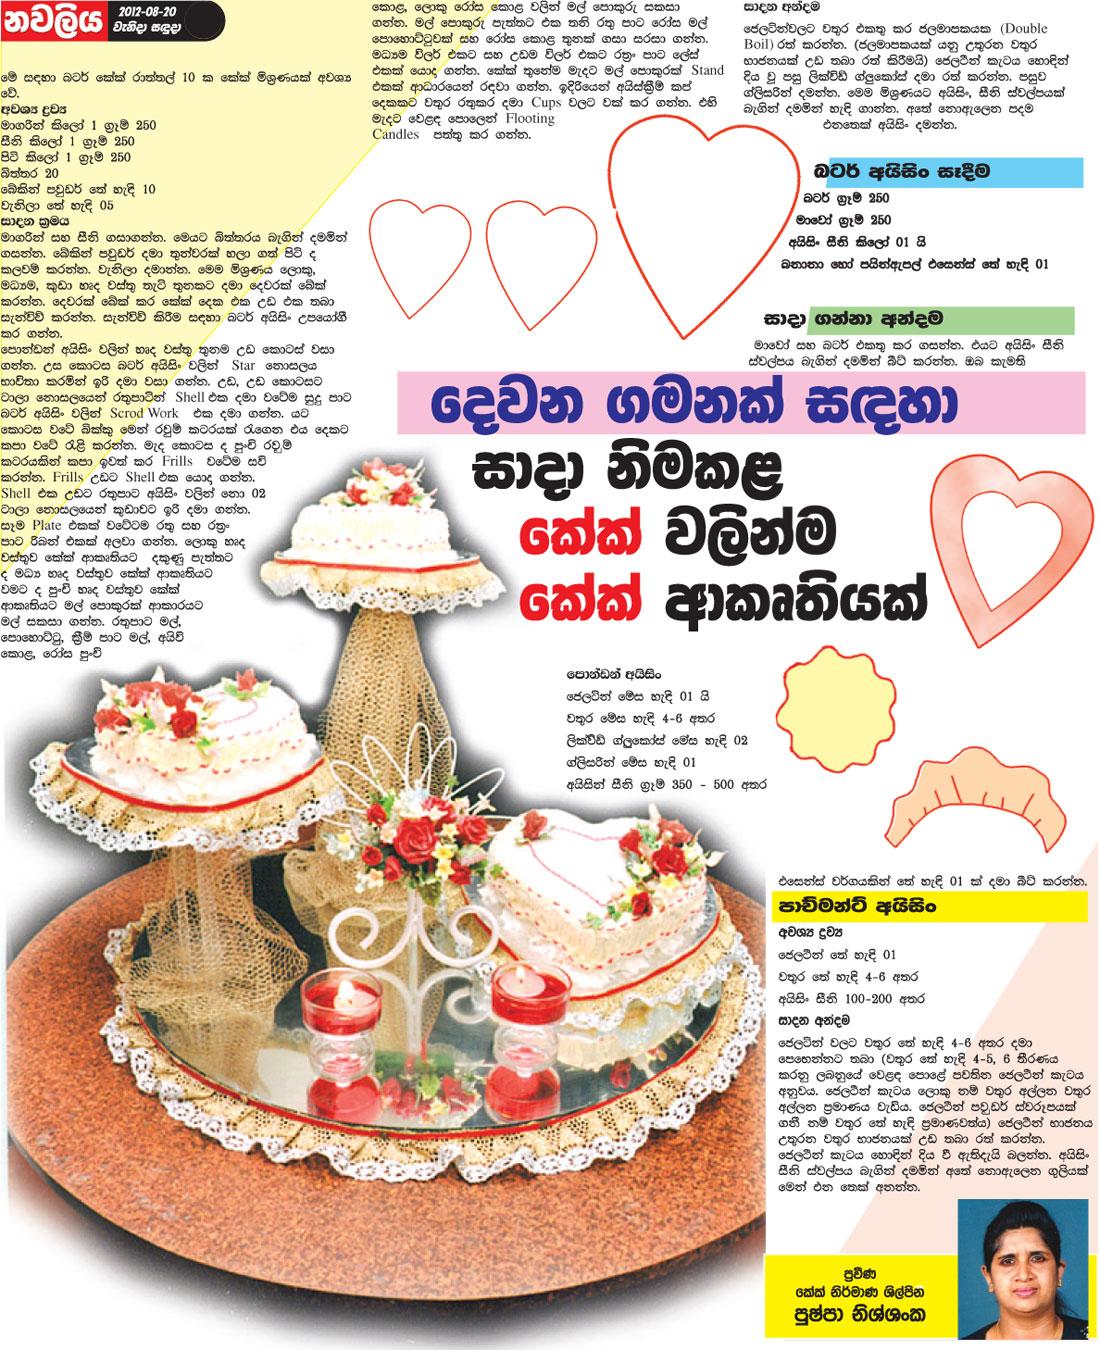 Wedding cake menu sinhala 5000 simple wedding cakes how forumfinder Choice Image